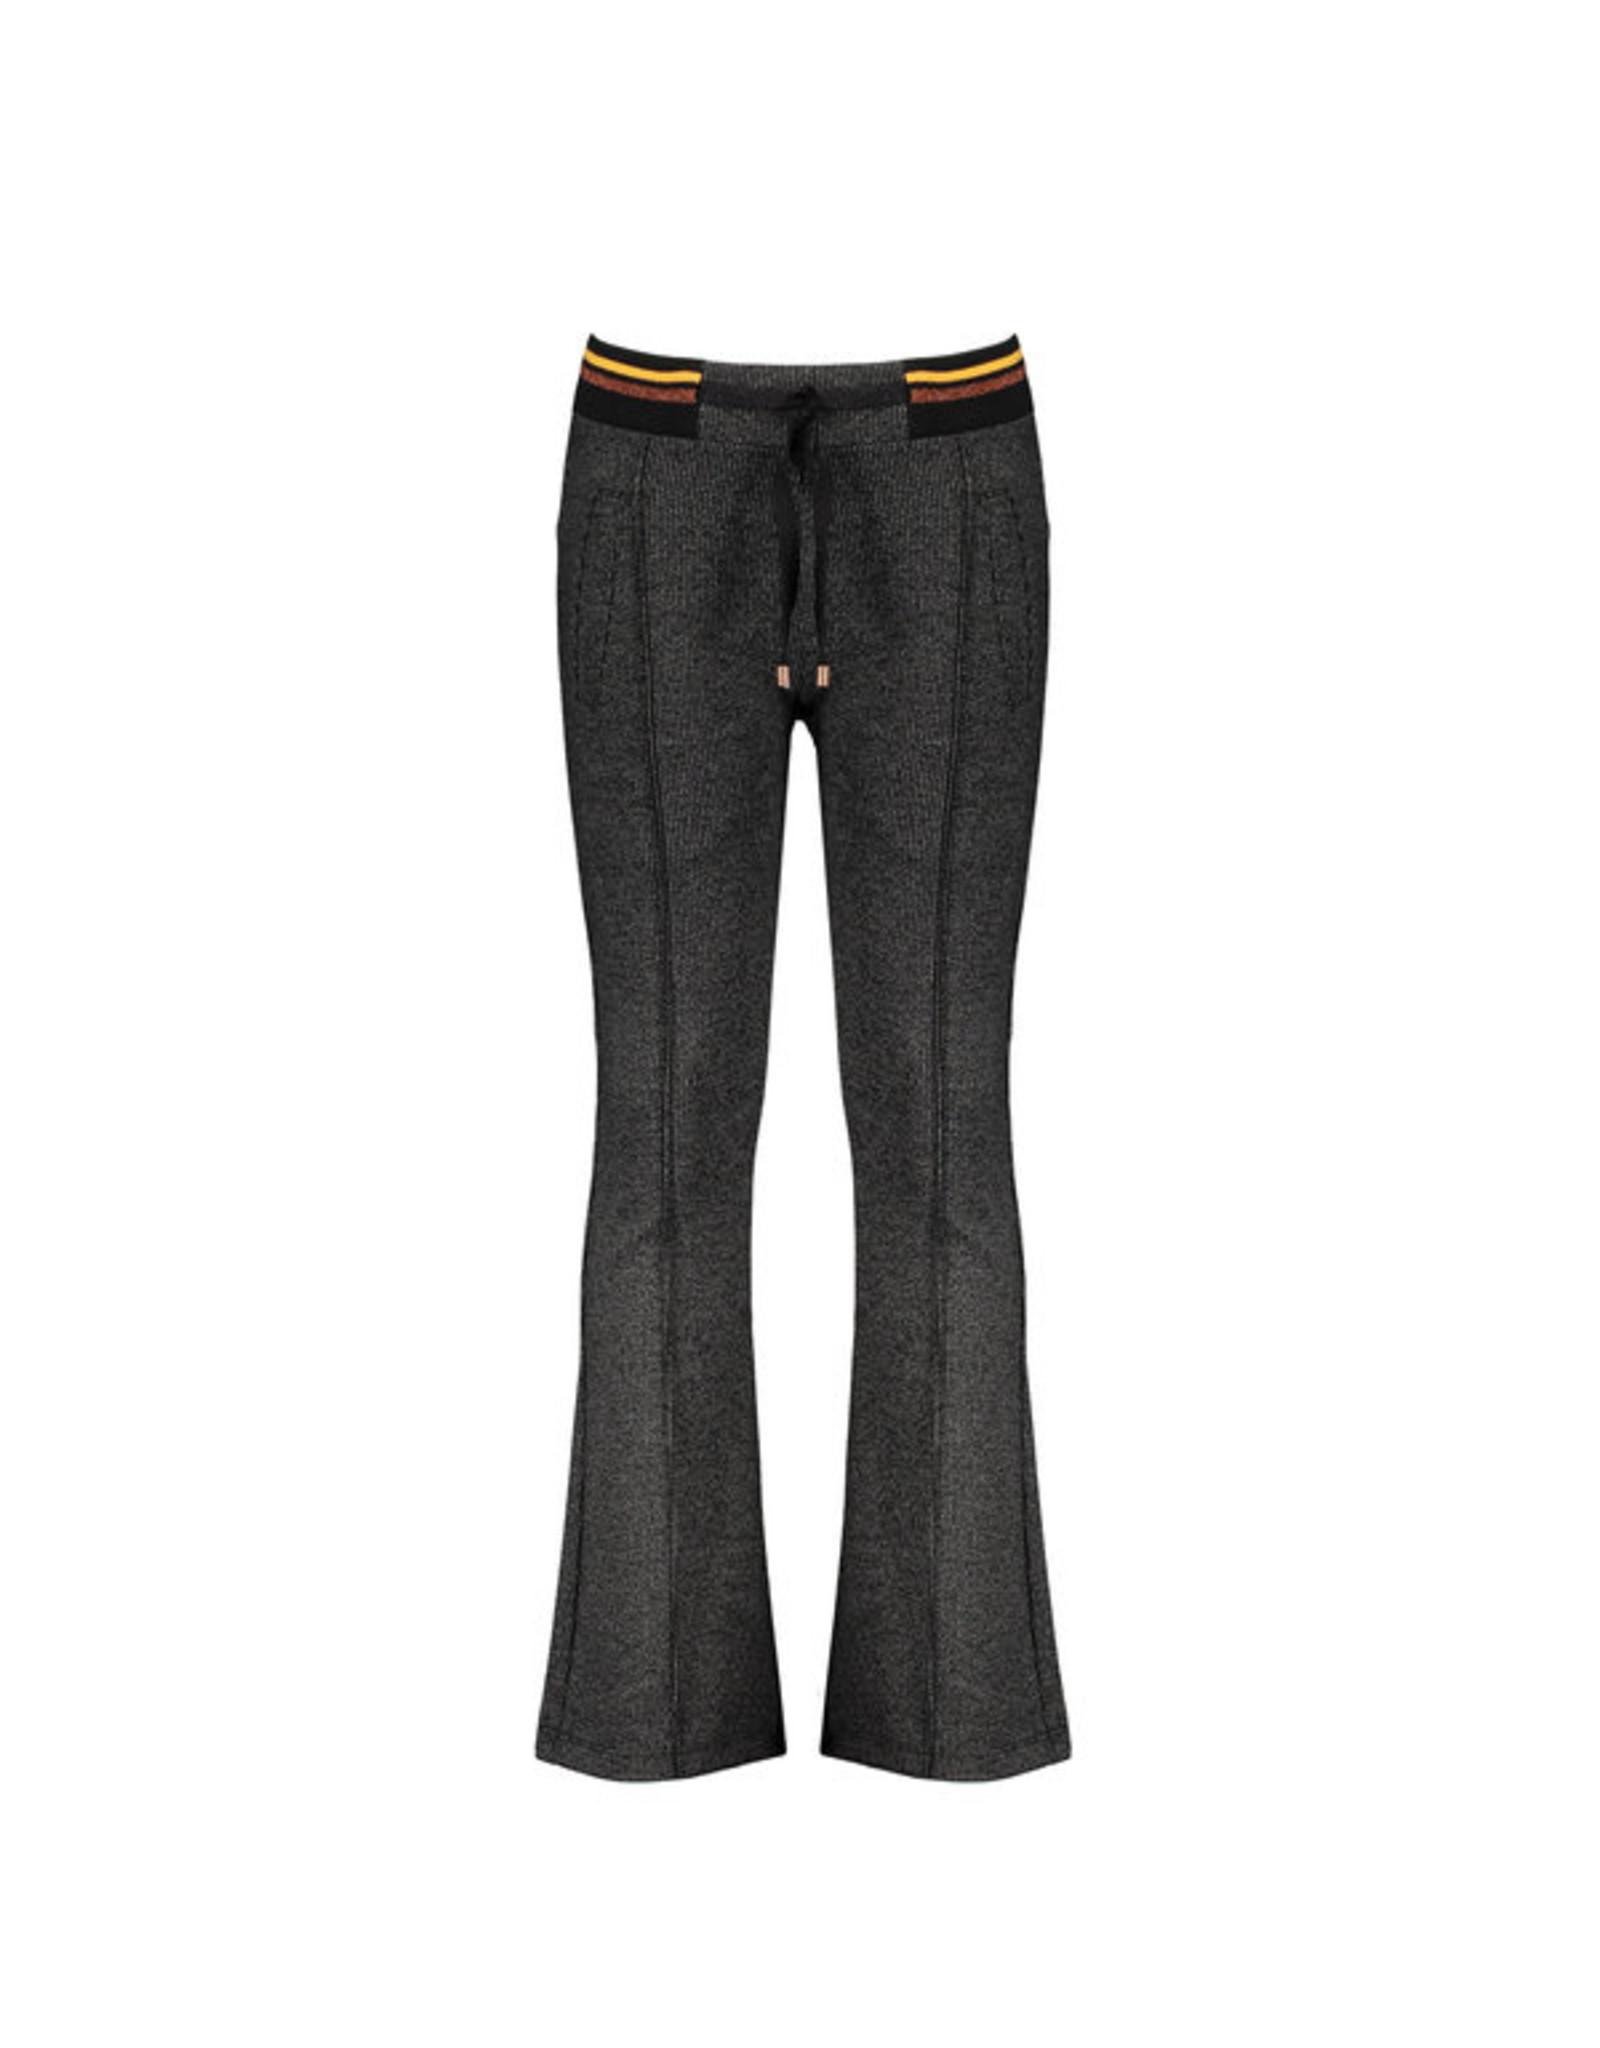 NONO NONO flared pants 5600 phantom